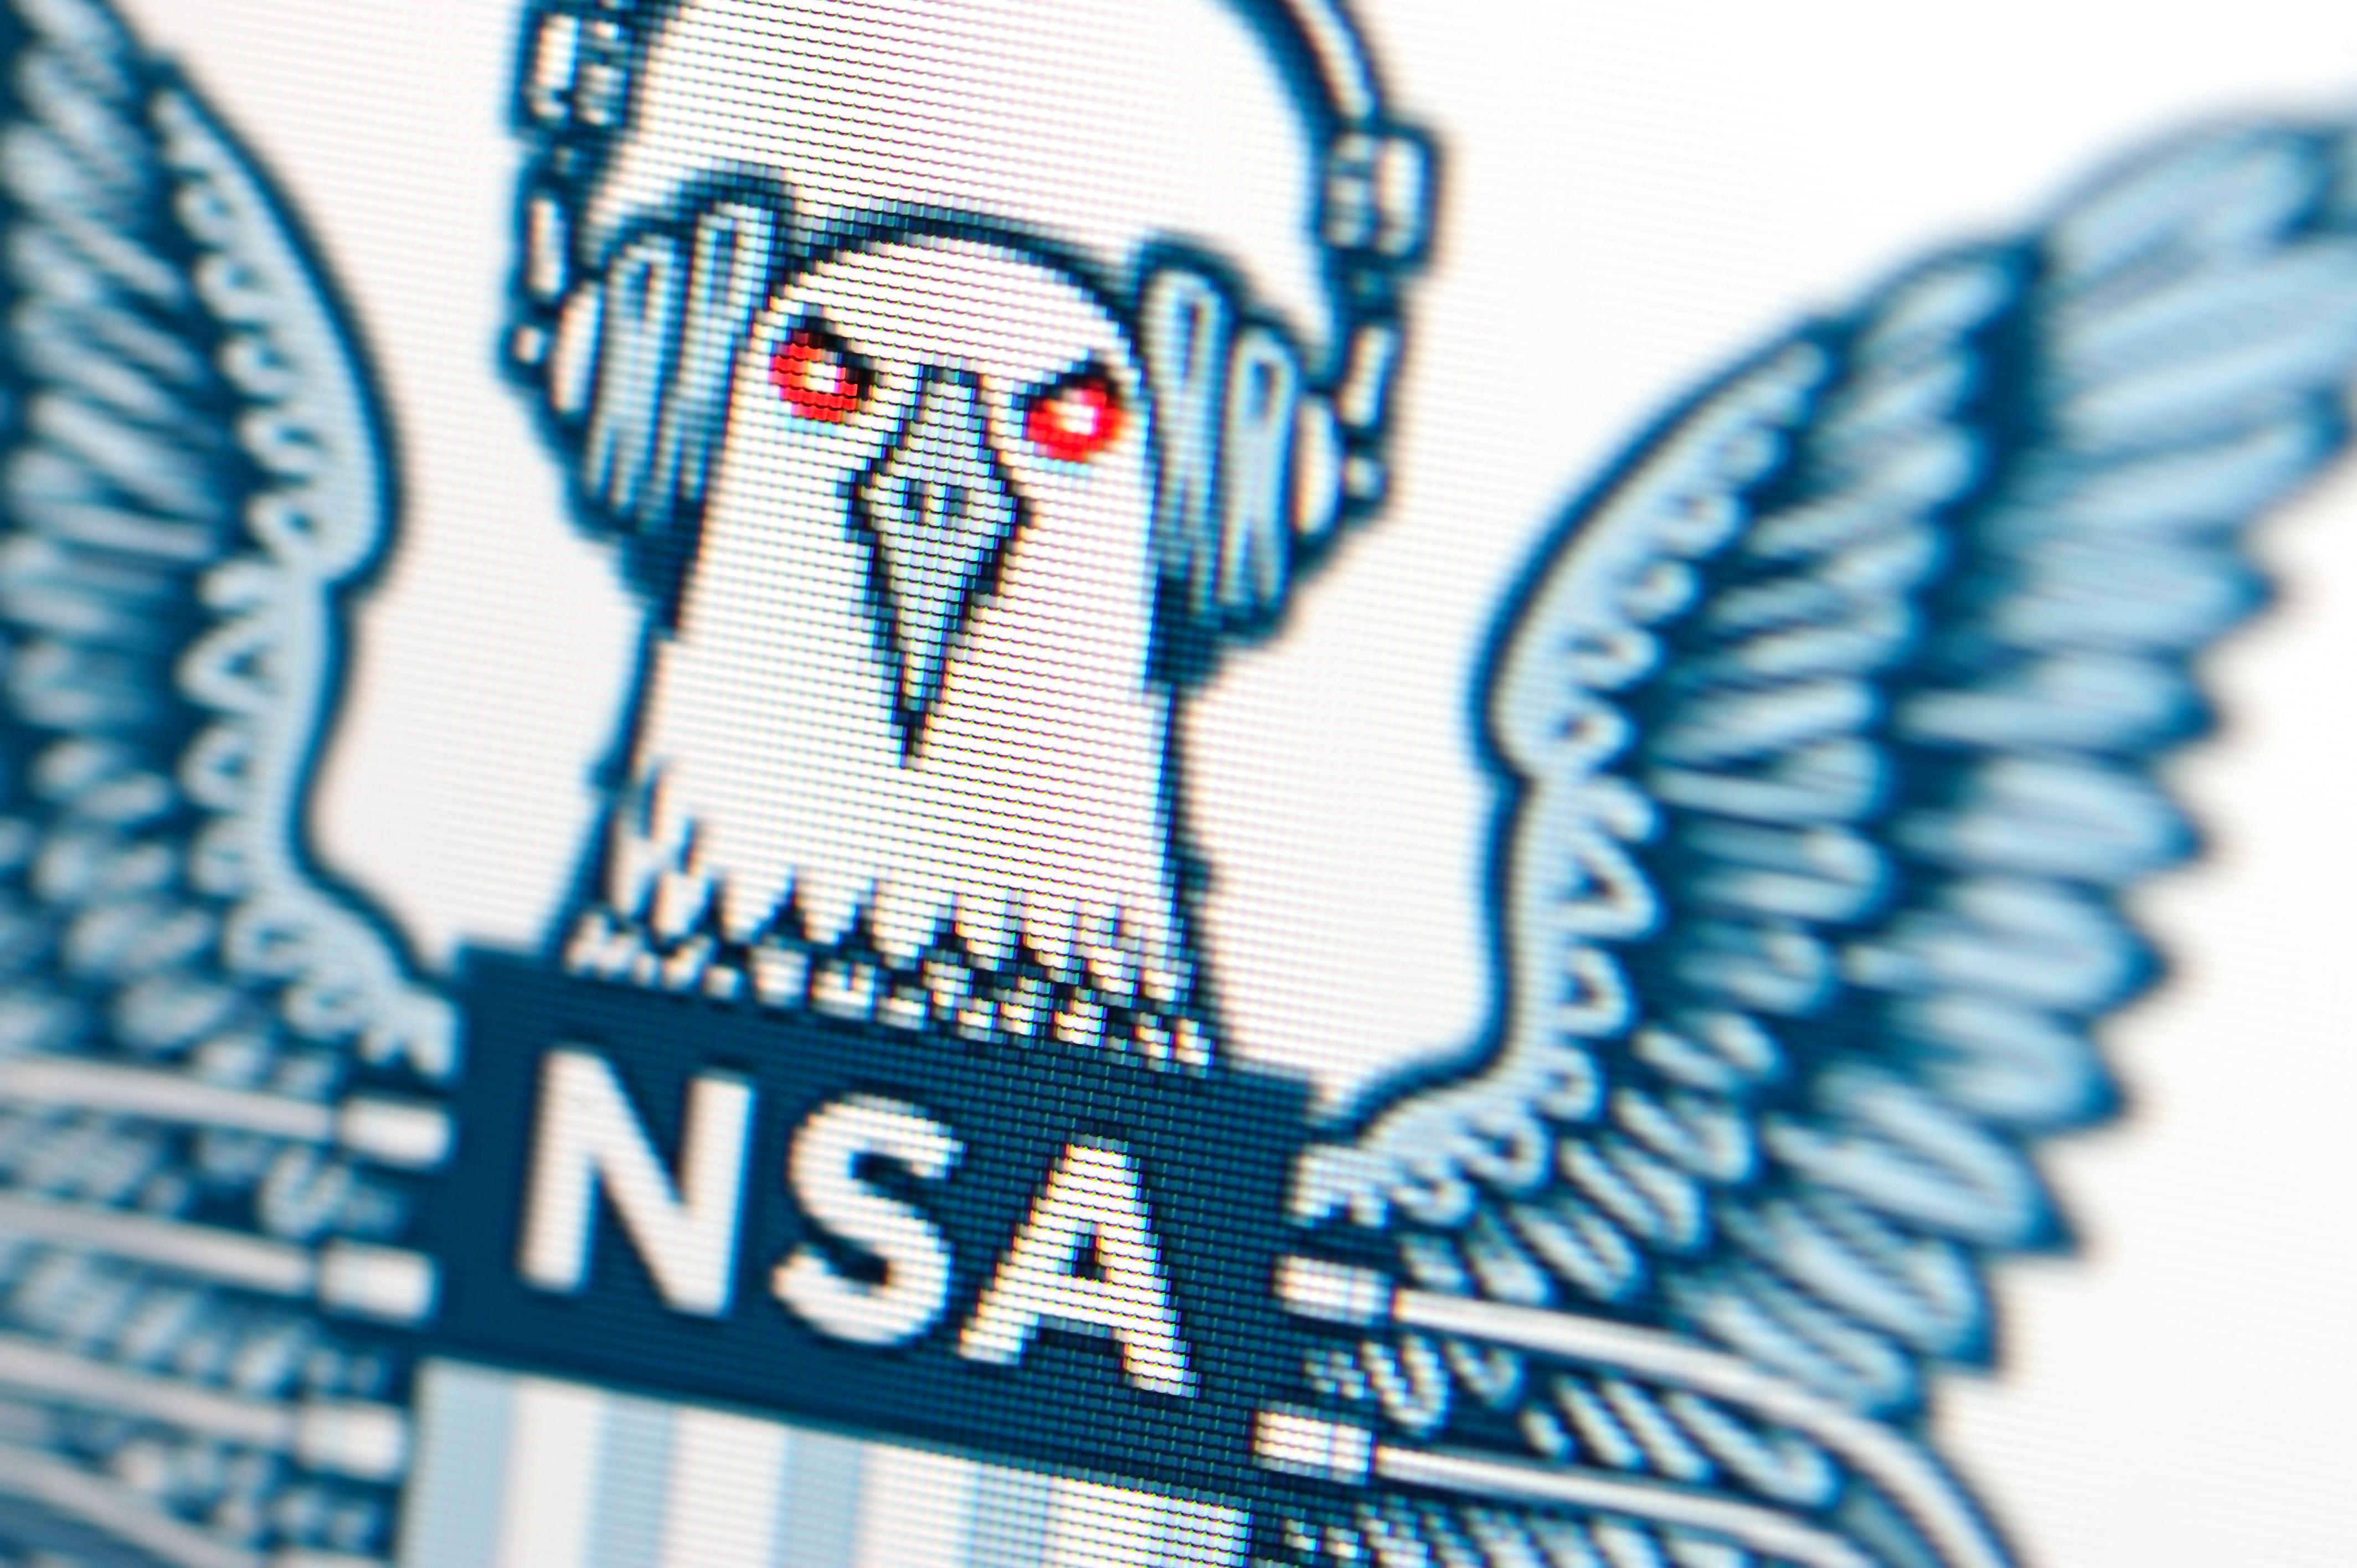 NSA surveillance logo - 17 Jan 2014